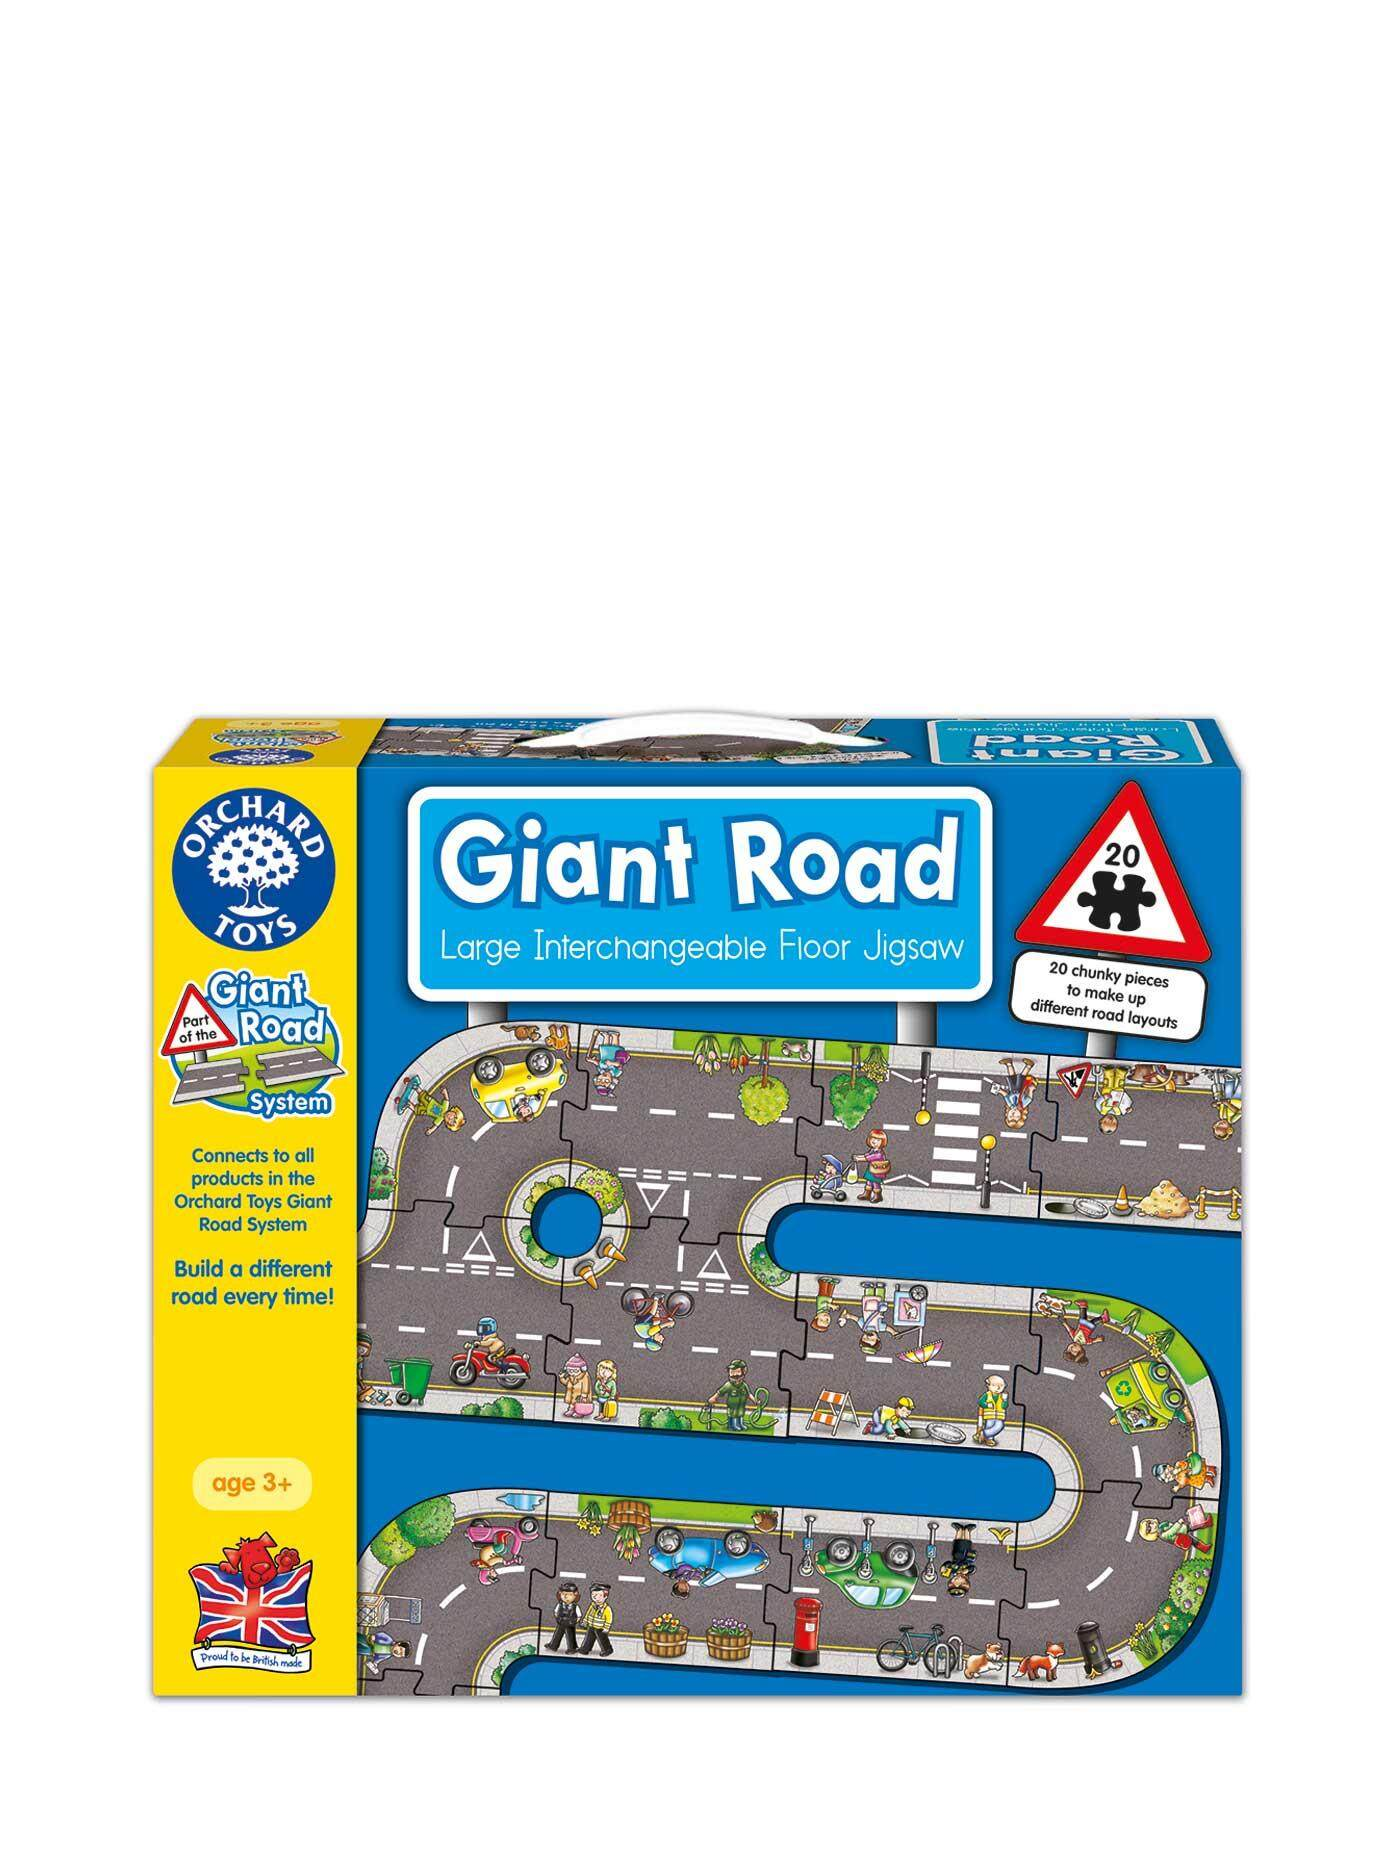 Orchard Toys จิ๊กซอว์ Giant Road รุ่น Lwt1604 By Lnwitem.